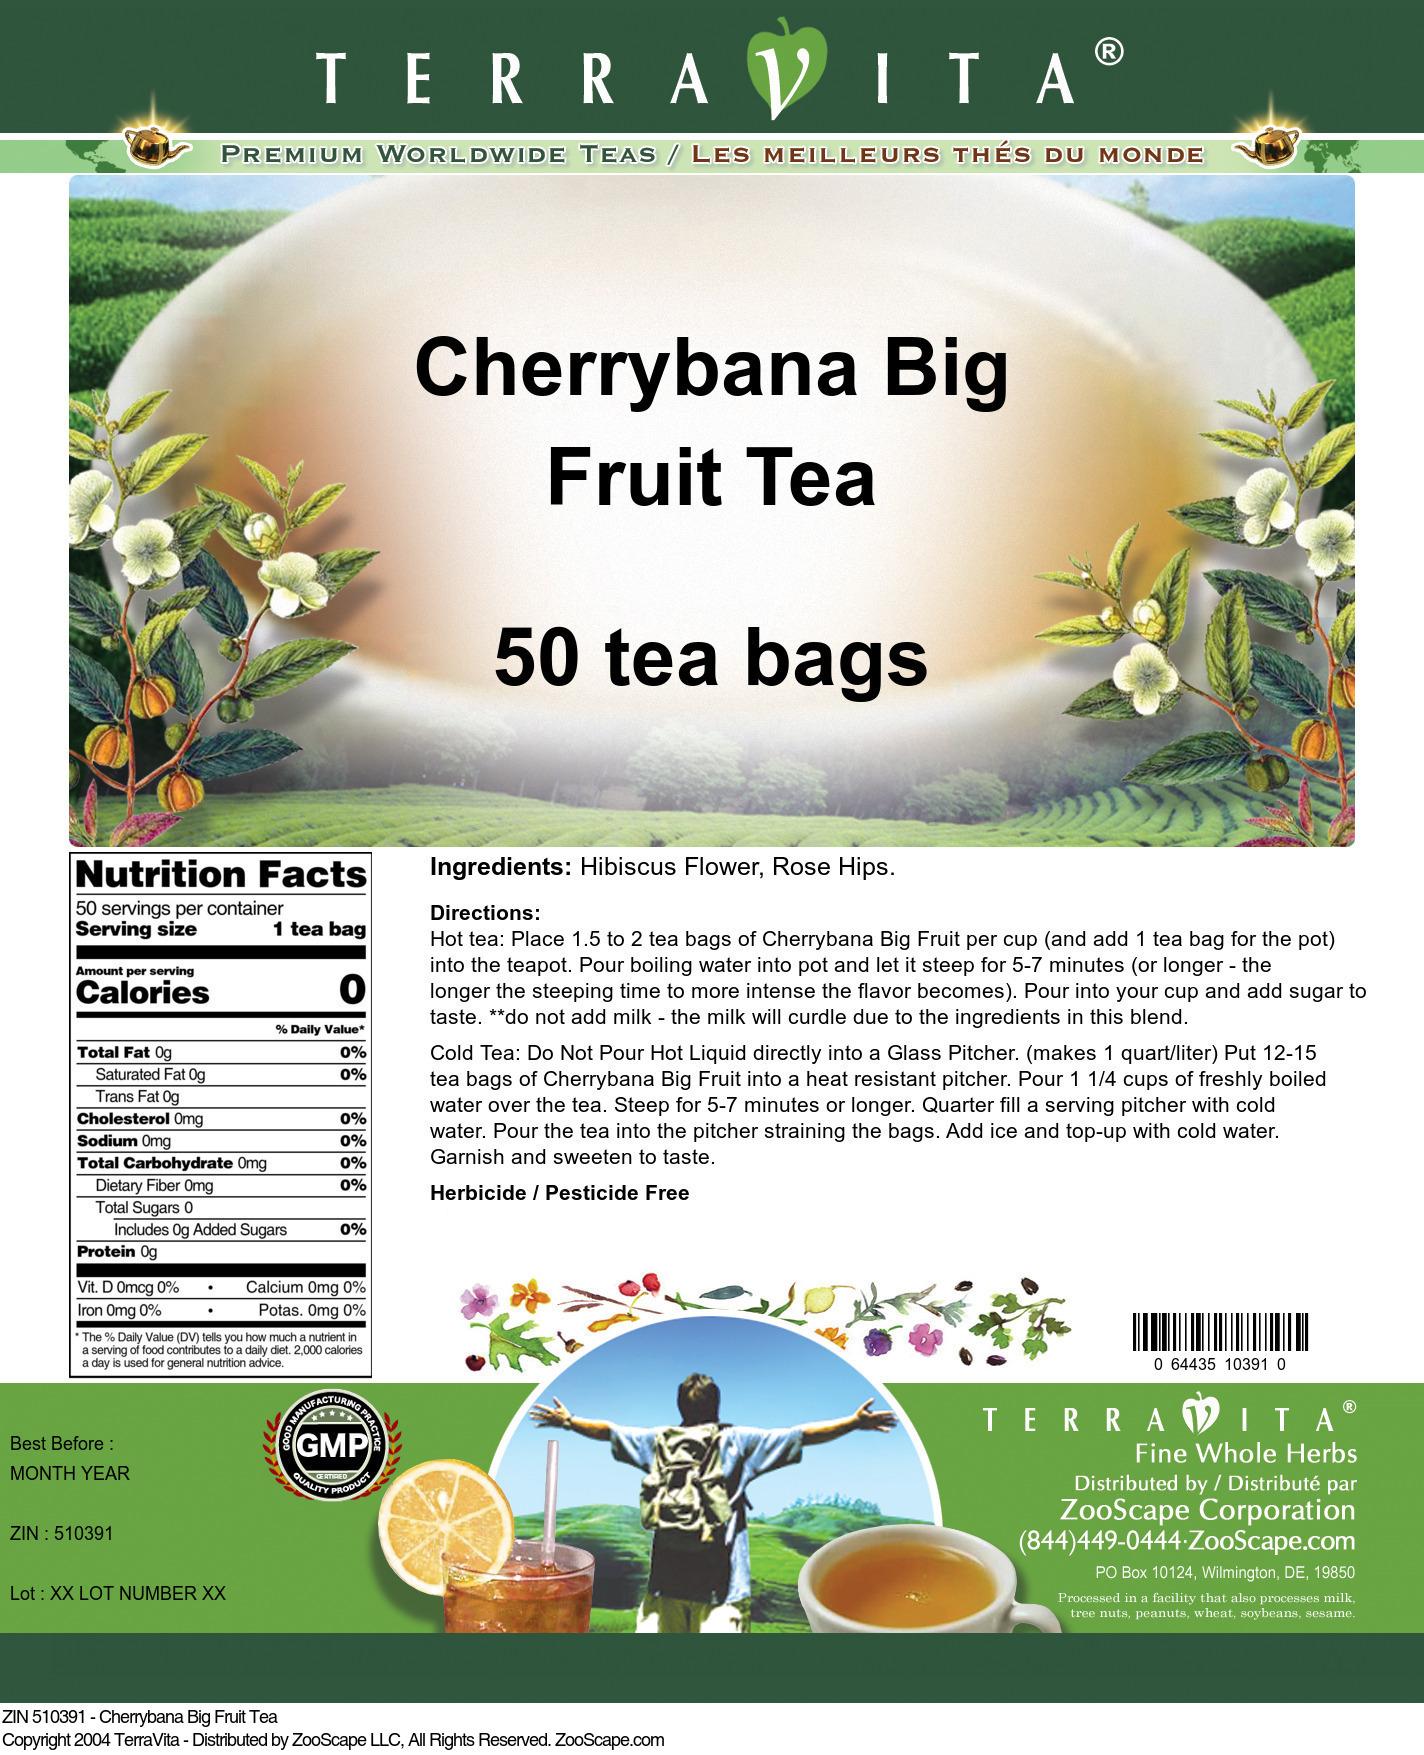 Cherrybana Big Fruit Tea